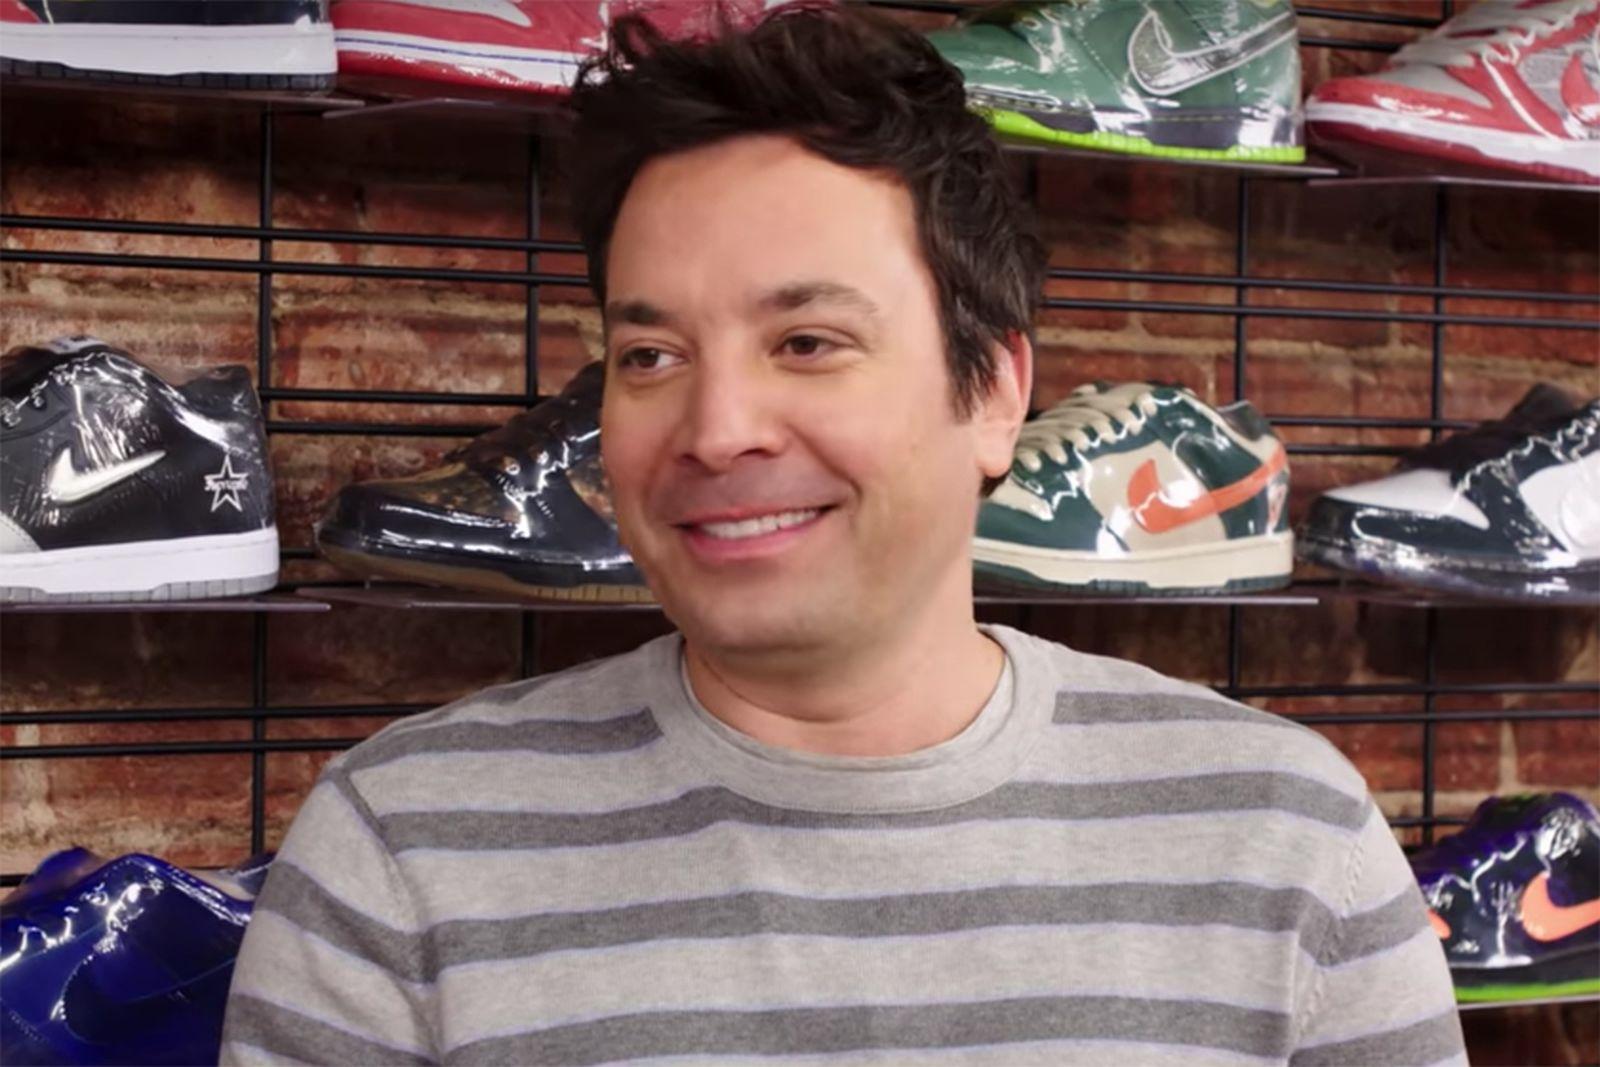 Jimmy Fallon Sneaker Shopping